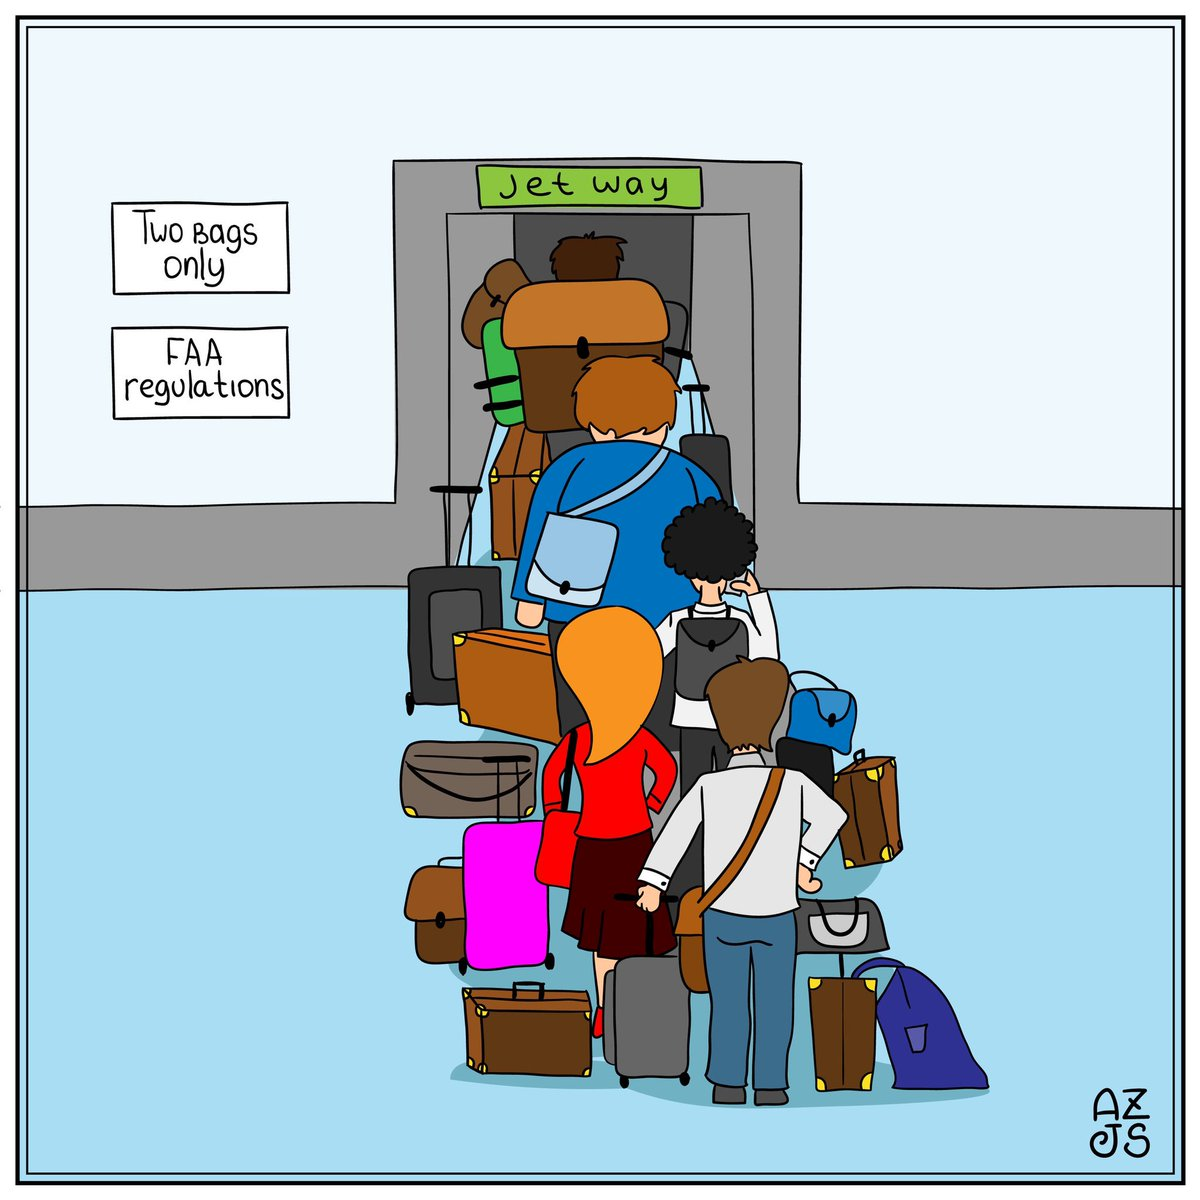 Traveler's Life (TM) #travel #travelcartoons #cartoons #airlinehumor #airlinelife #travellife #toomuchbaggage @alex.zhuro #traveler #traveltime #cartoonsbyalexzhuroandjonsanchez #comicstrip #comics